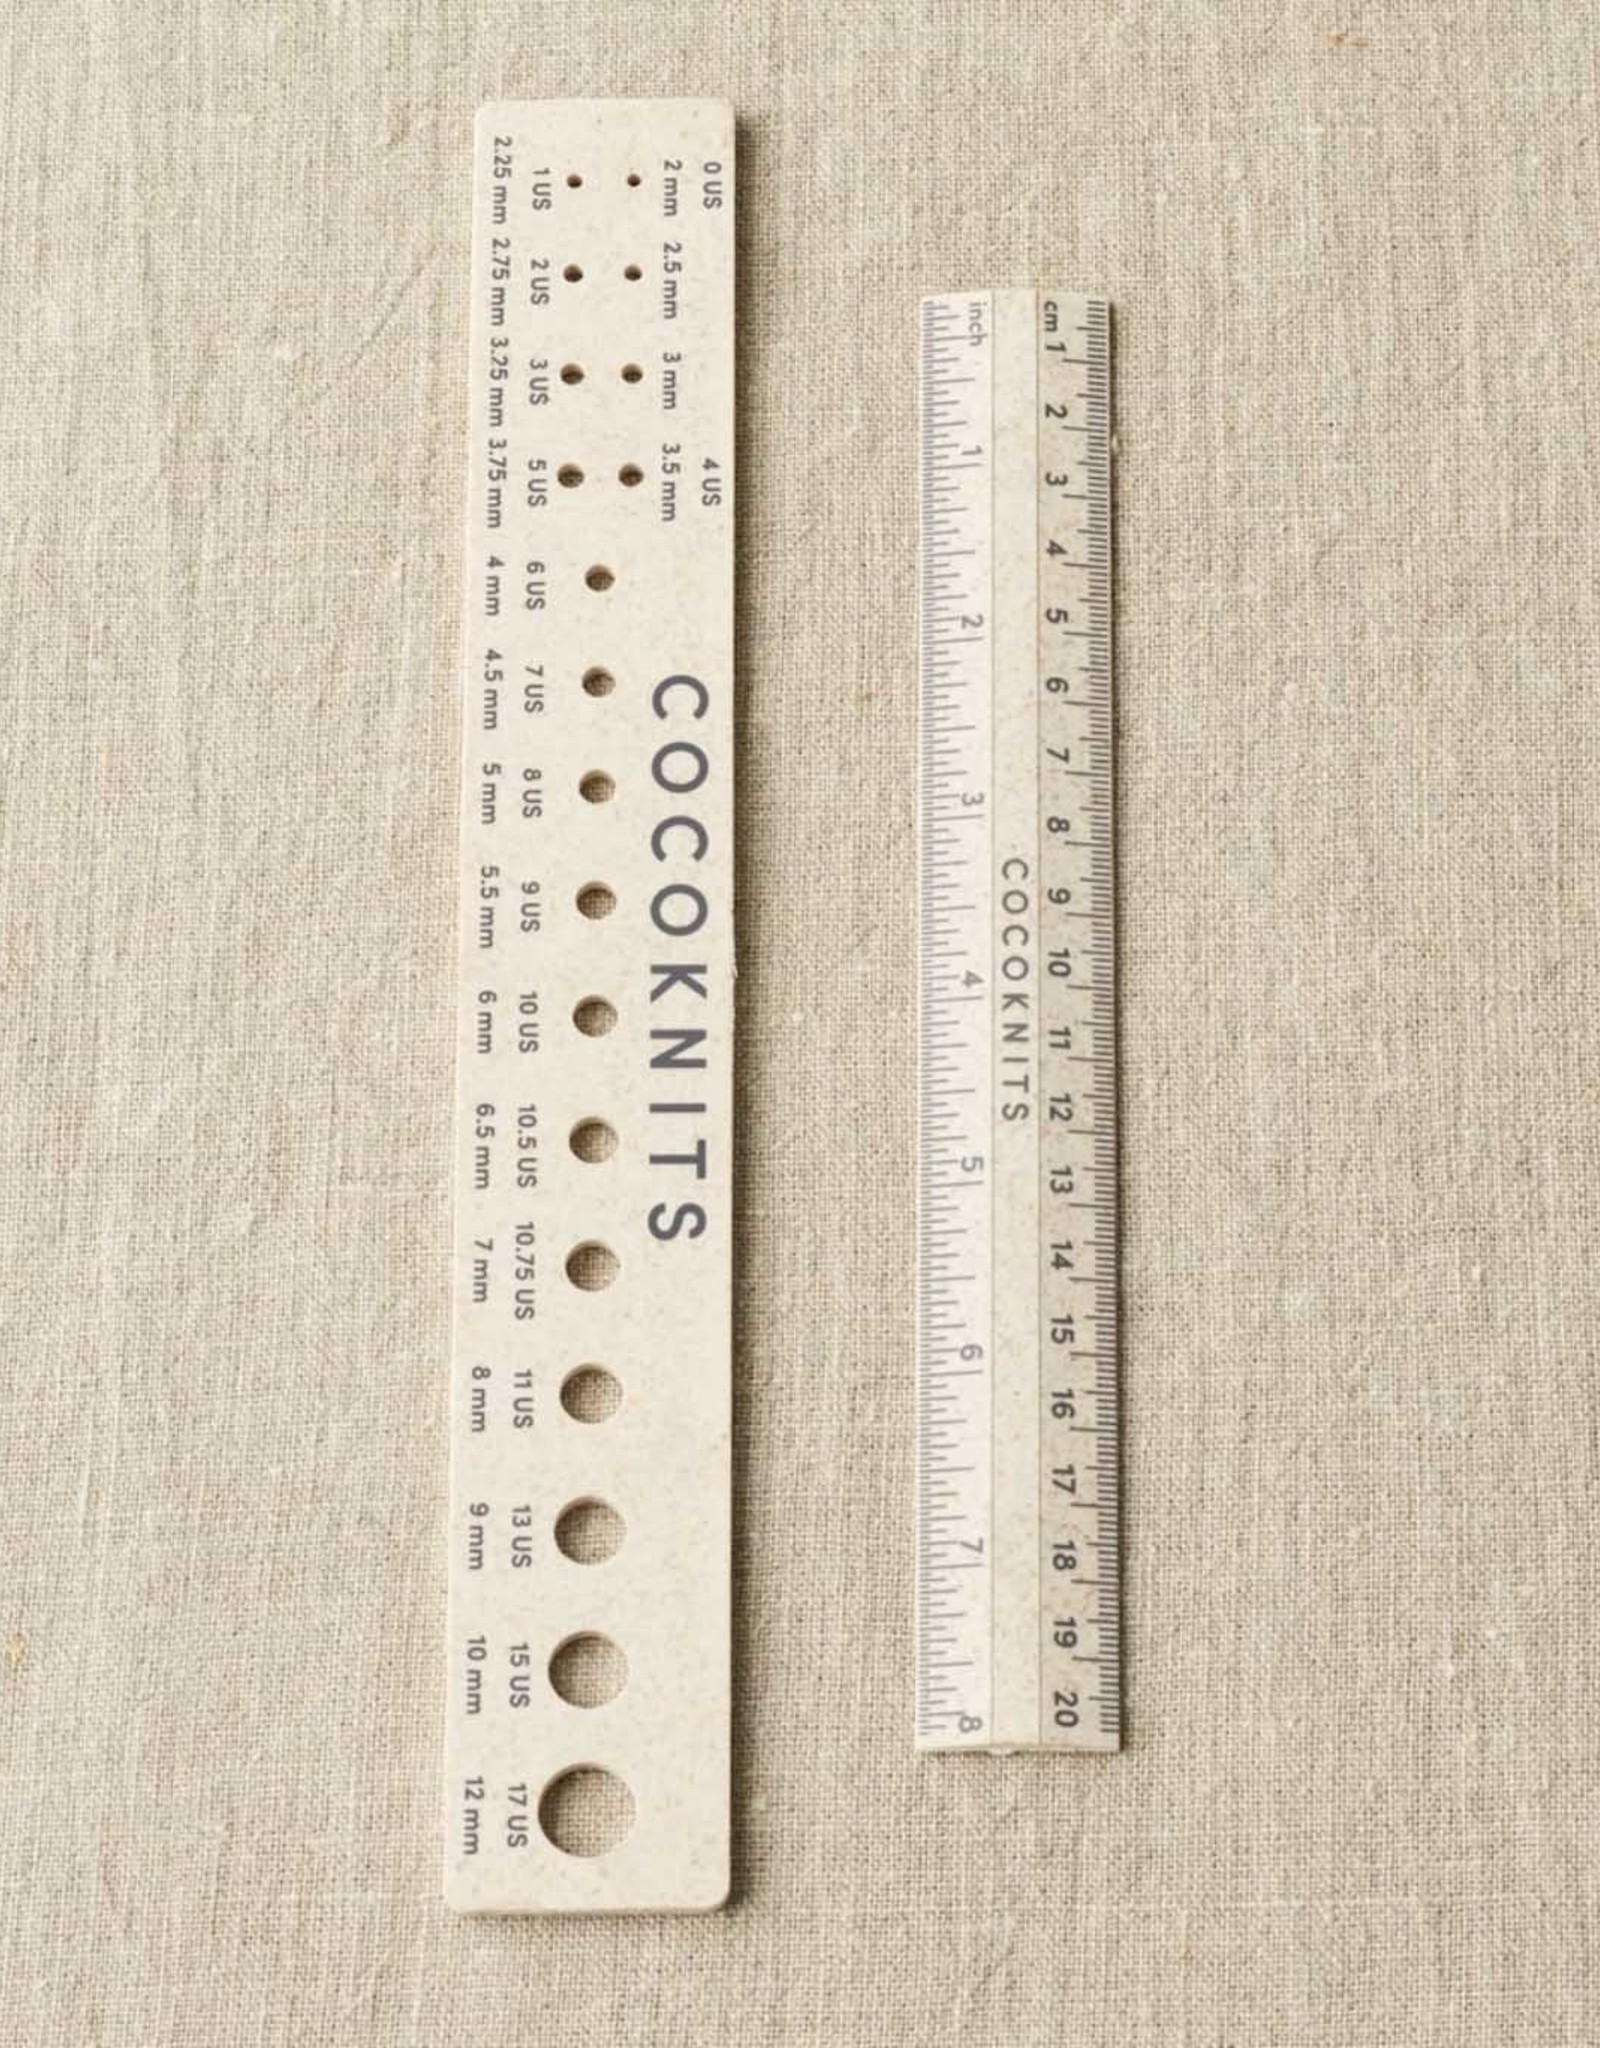 Cocoknits Ruler and Gauge Set